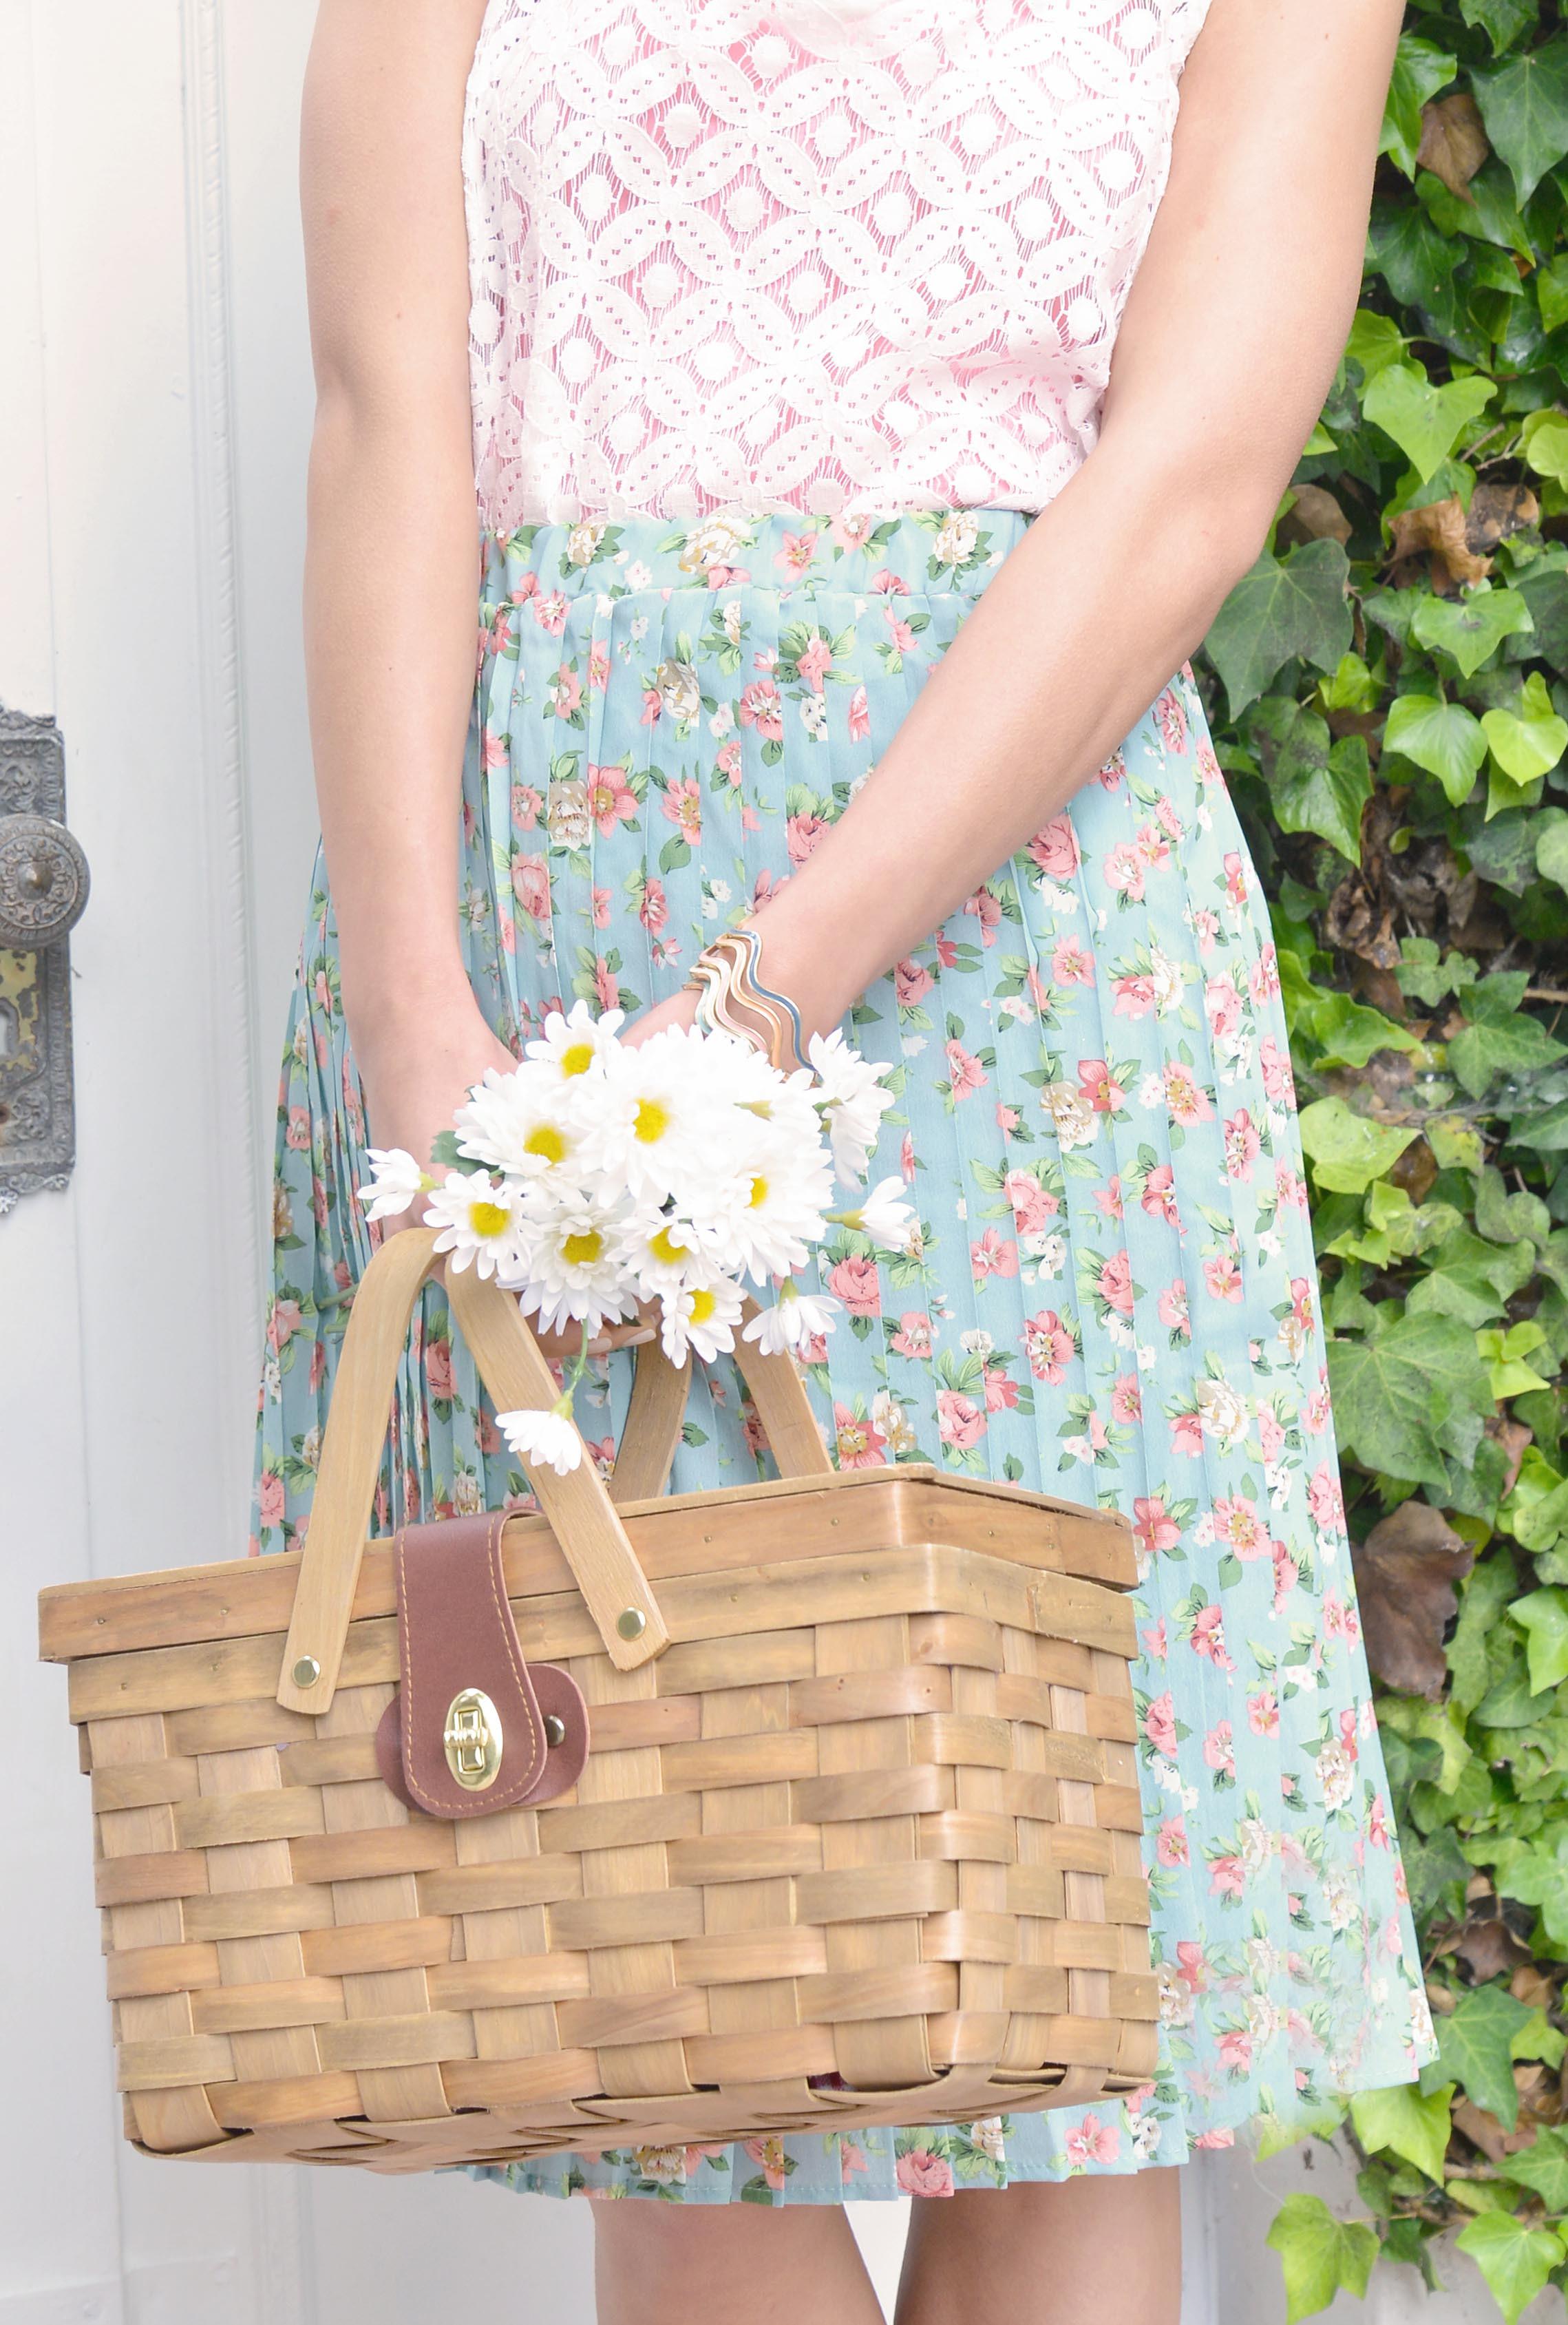 1115581db5 Skirt - Spring Sonnet Floral Accordion Pleat Midi Skirt in Hazy Blue